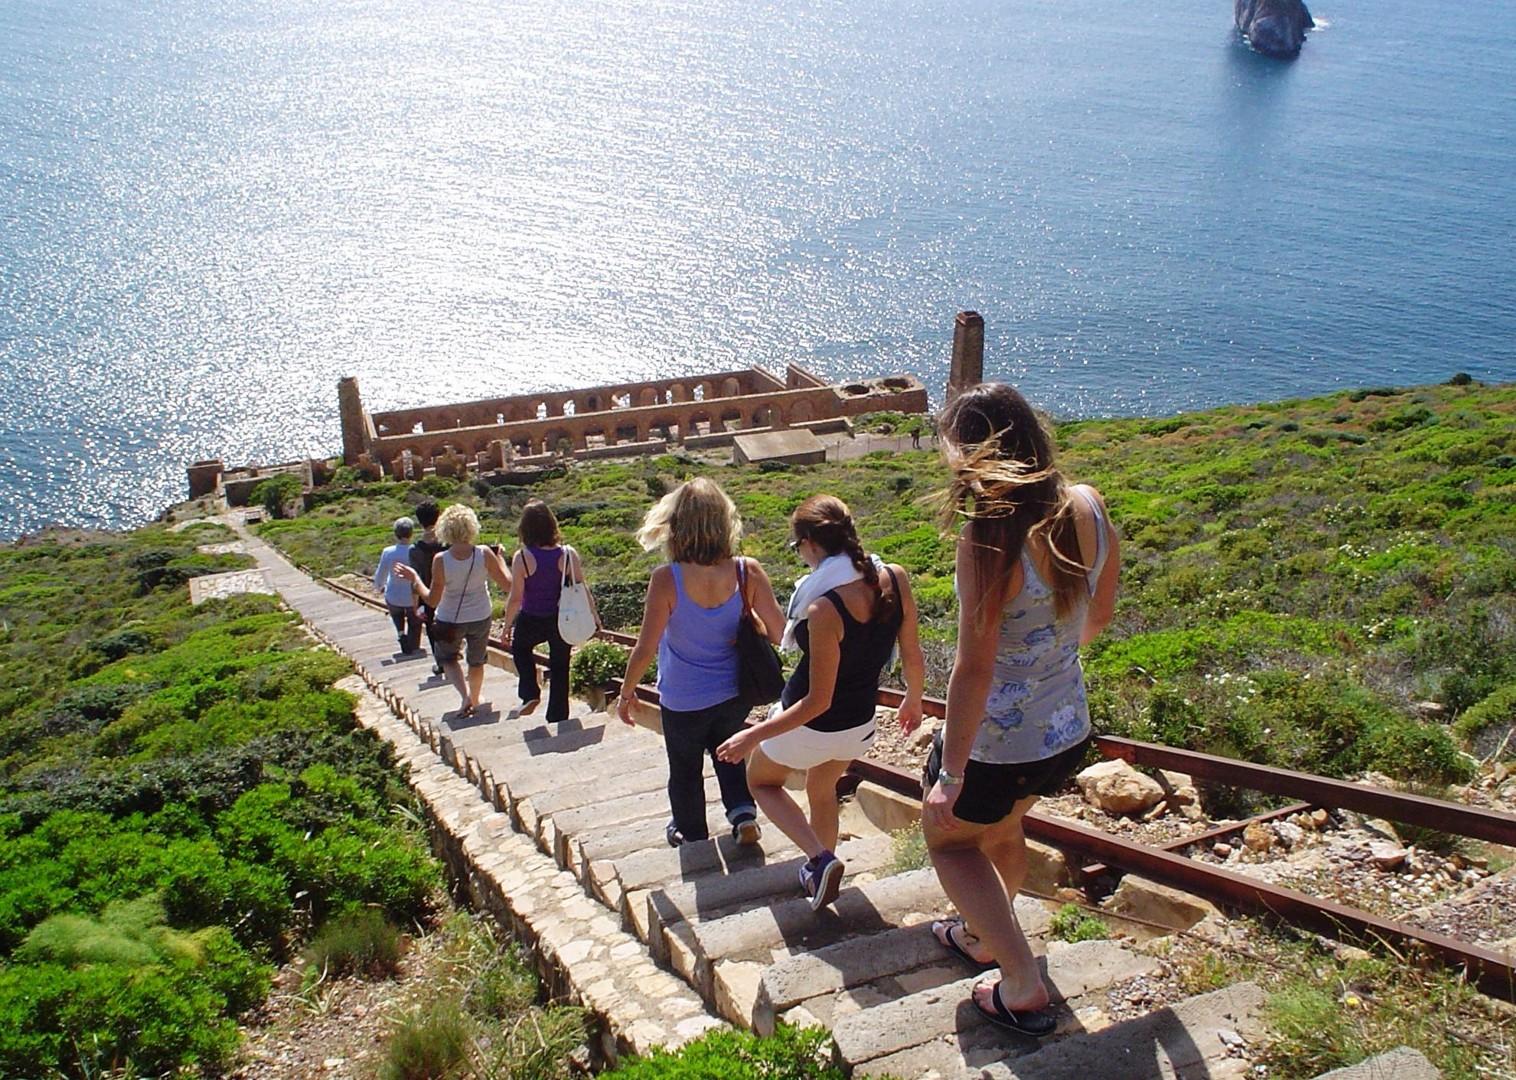 island-flavours-sardinia-coastal-pathways.jpg - Italy - Sardinia - Island Flavours - Self-Guided Leisure Cycling Holiday - Italia Leisure and Family Cycling